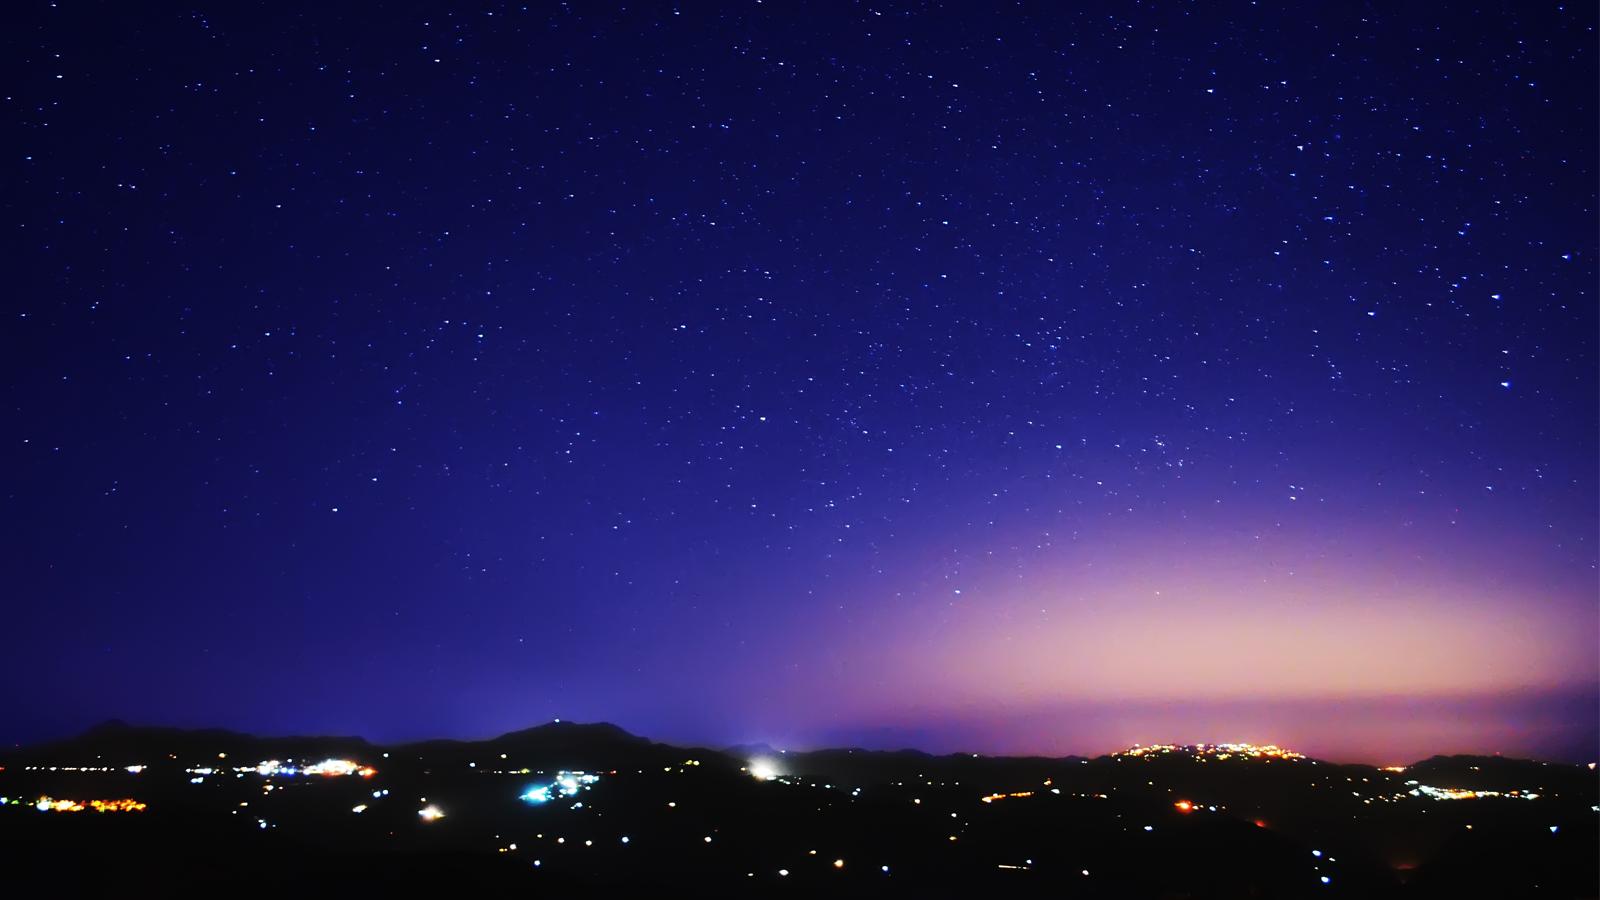 Purple Night Sky Wallpaper